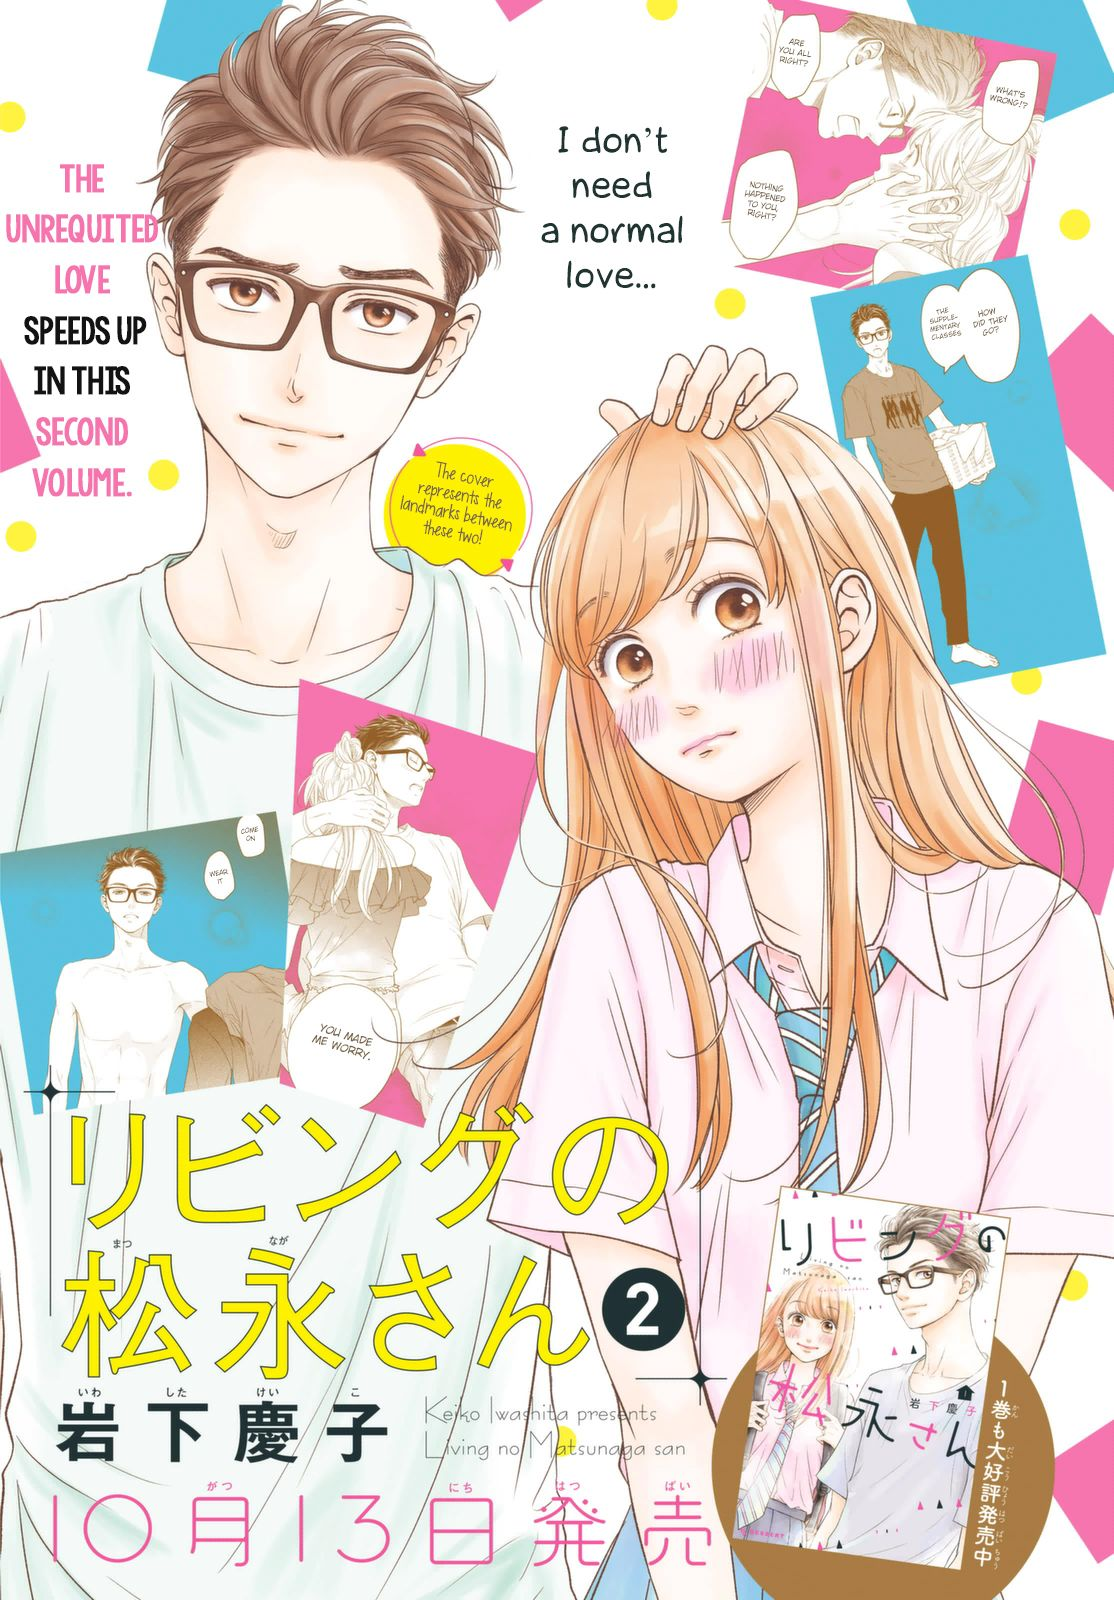 Read Manga Living No Matsunaga San Vol 003 Ch 009 Room 009 Online In High Quality Manga Anime Manga Anime